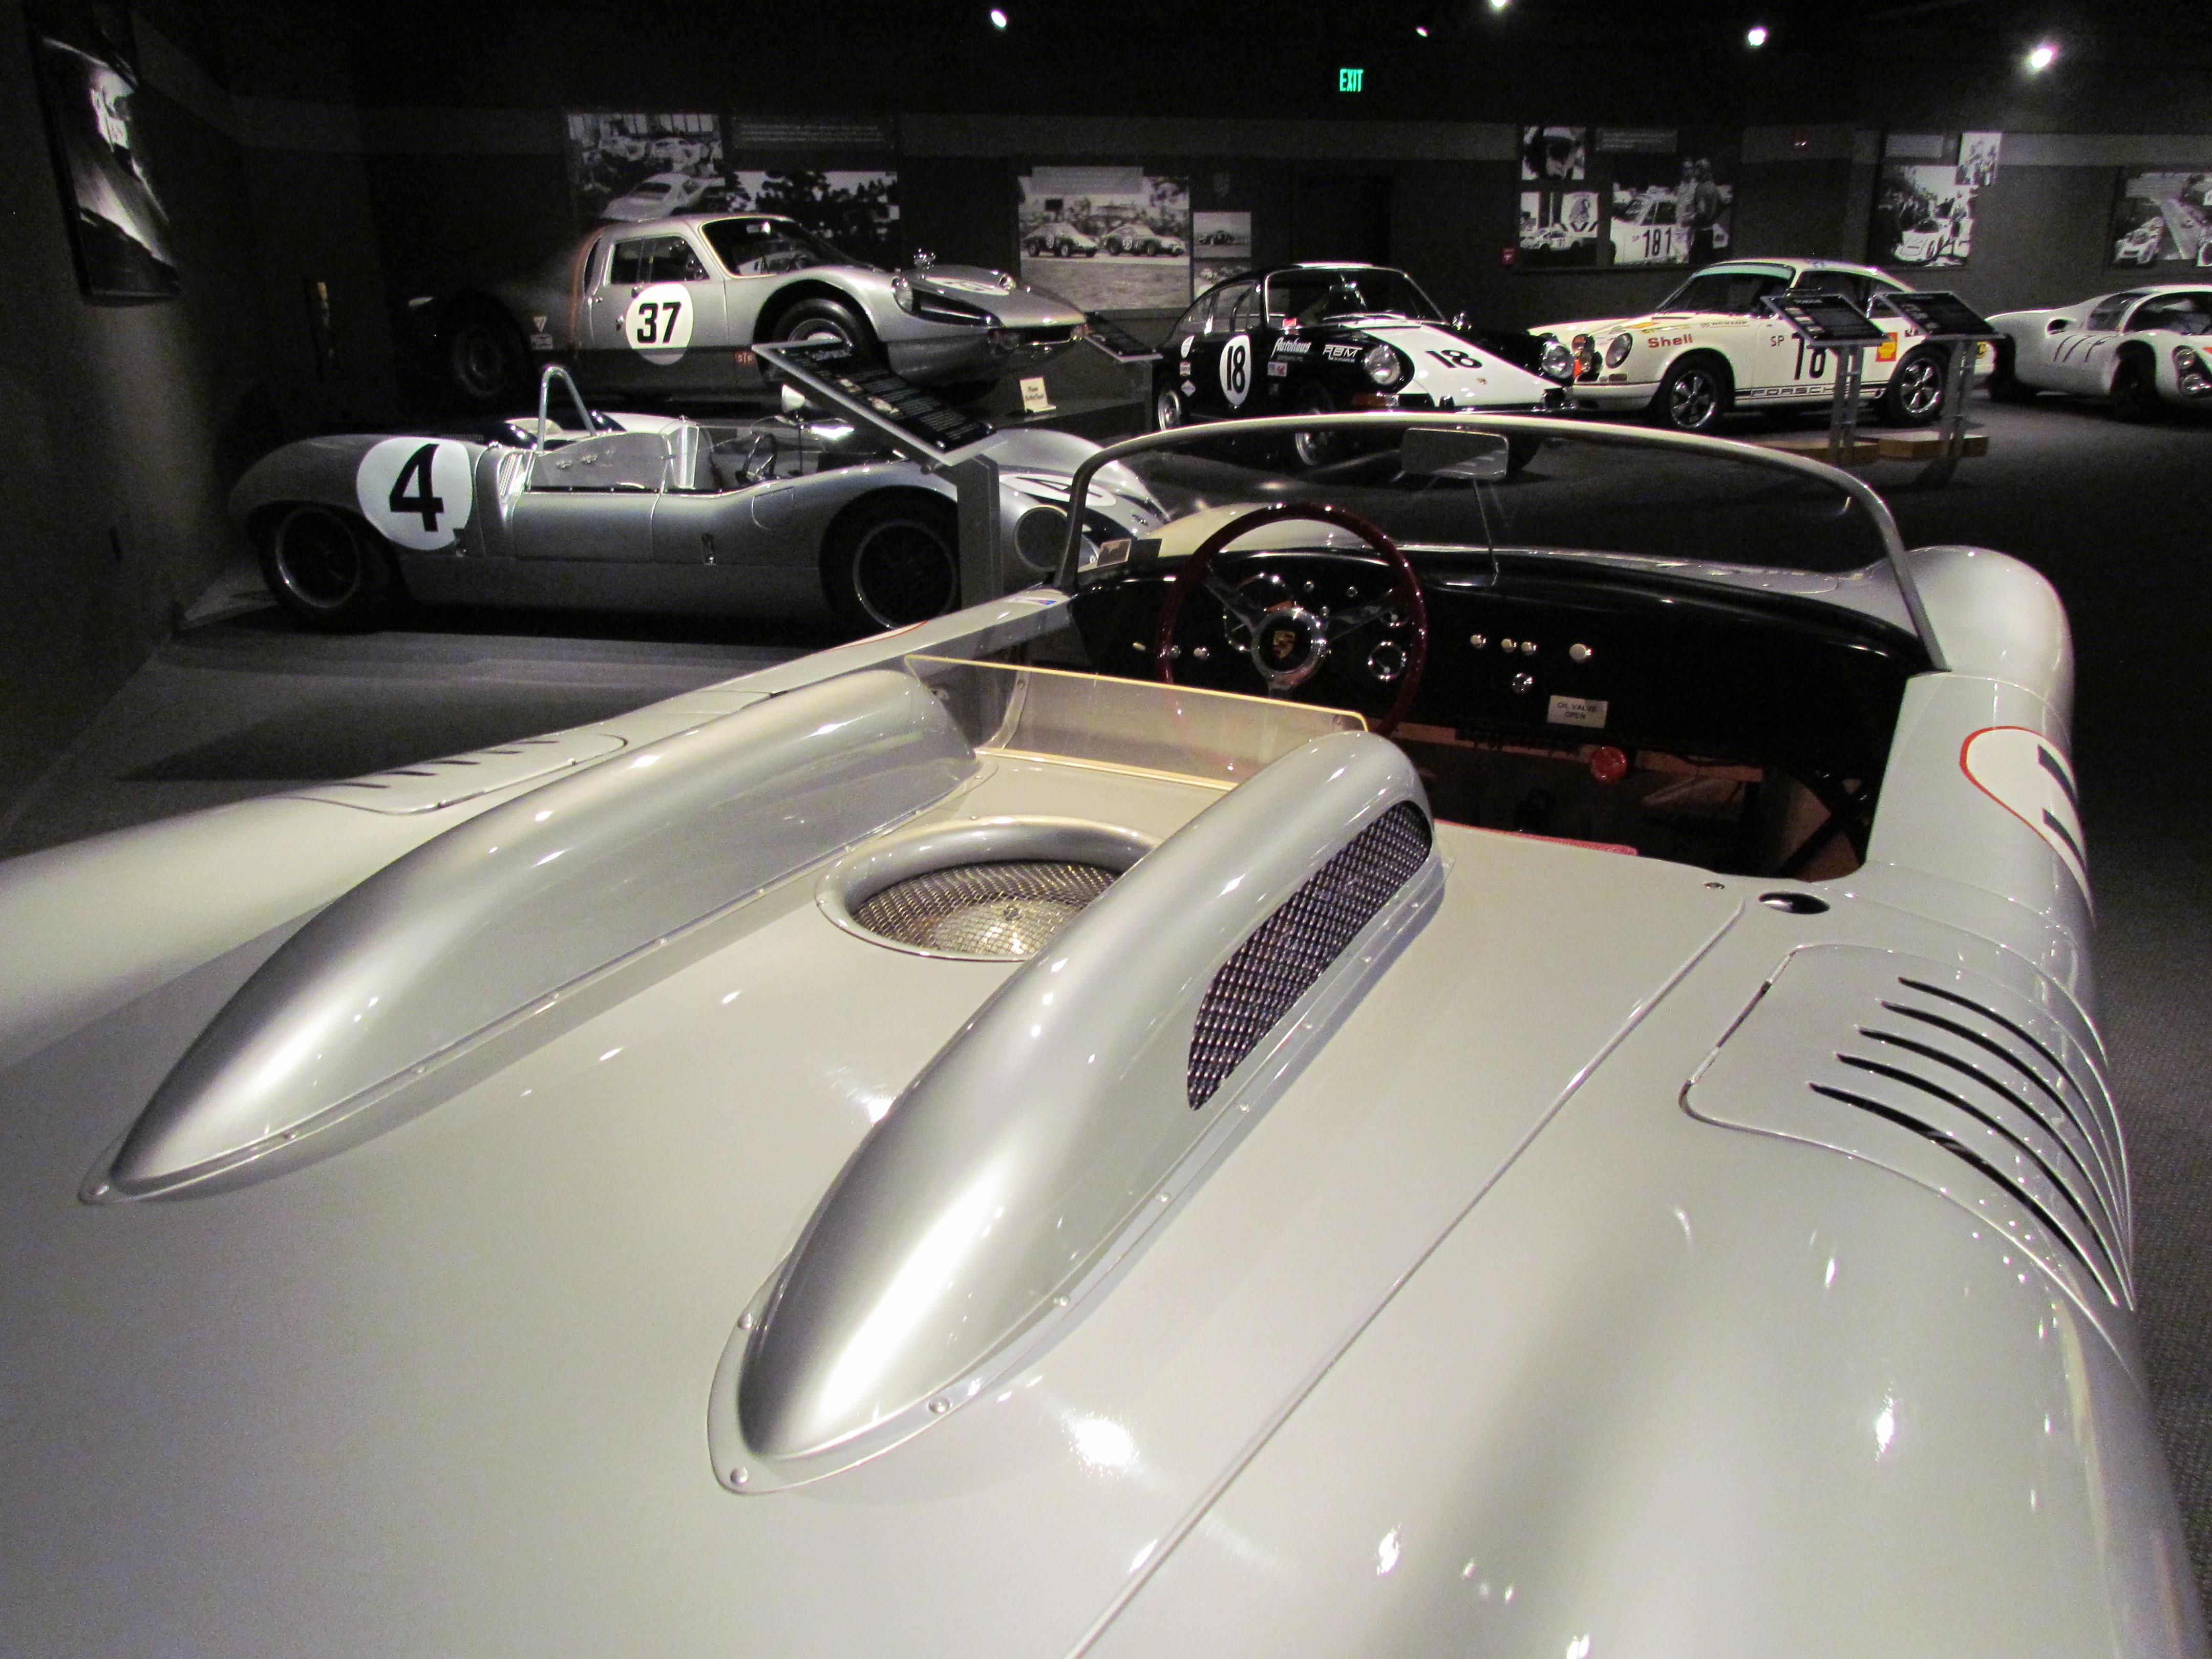 Theres Also A Terrific Porsche Exhibit On The East Coast - Naples antique car show 2018